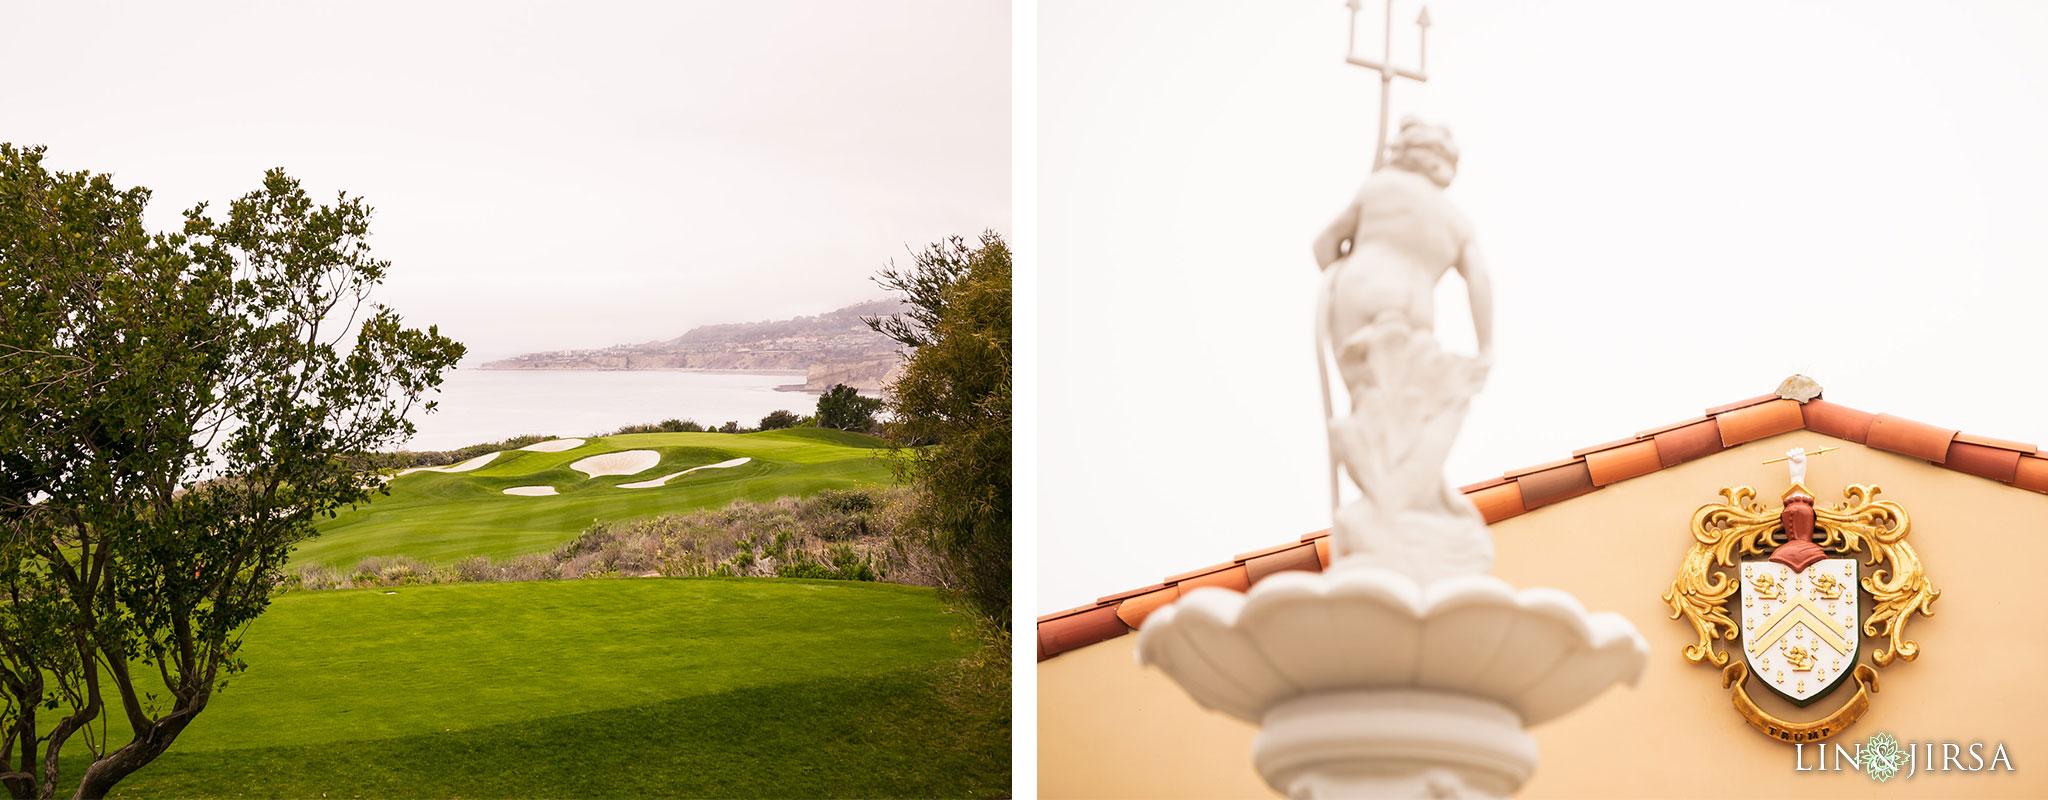 01 trump national golf club rancho palos verdes wedding bride photography